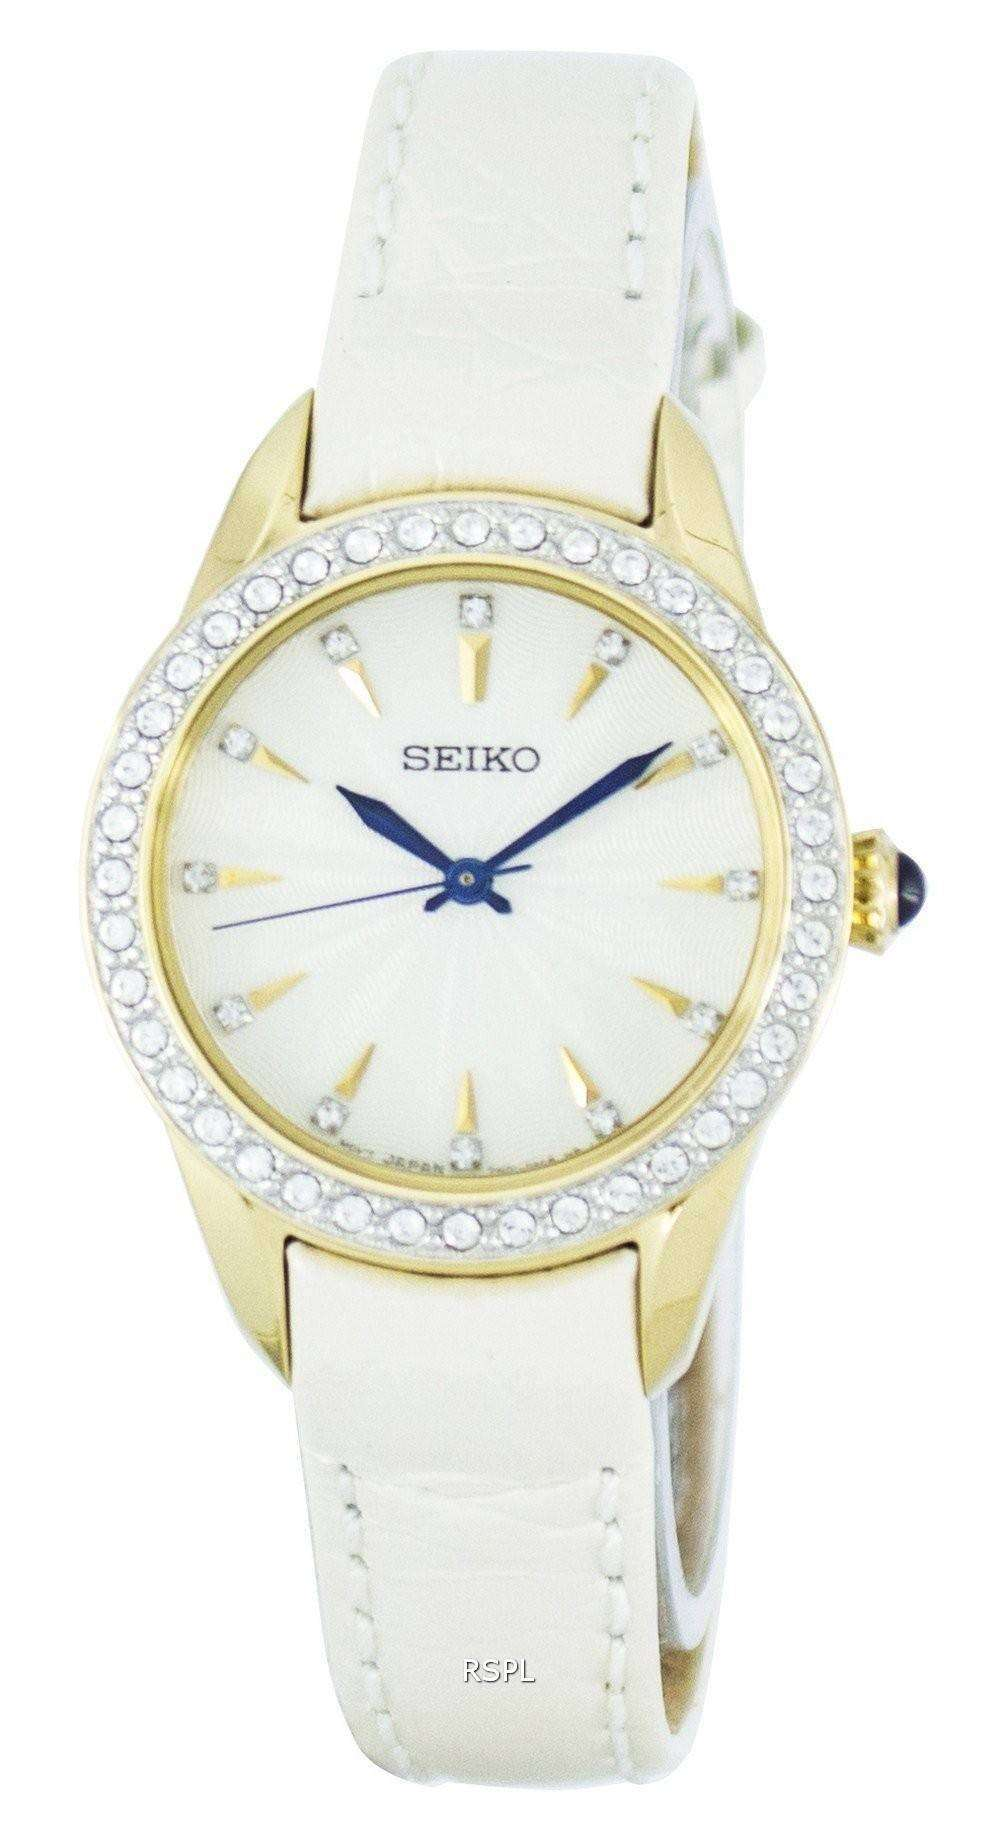 Seiko quartz swarovski crystals srz386p2 women 39 s watch for Swarovski crystals watch